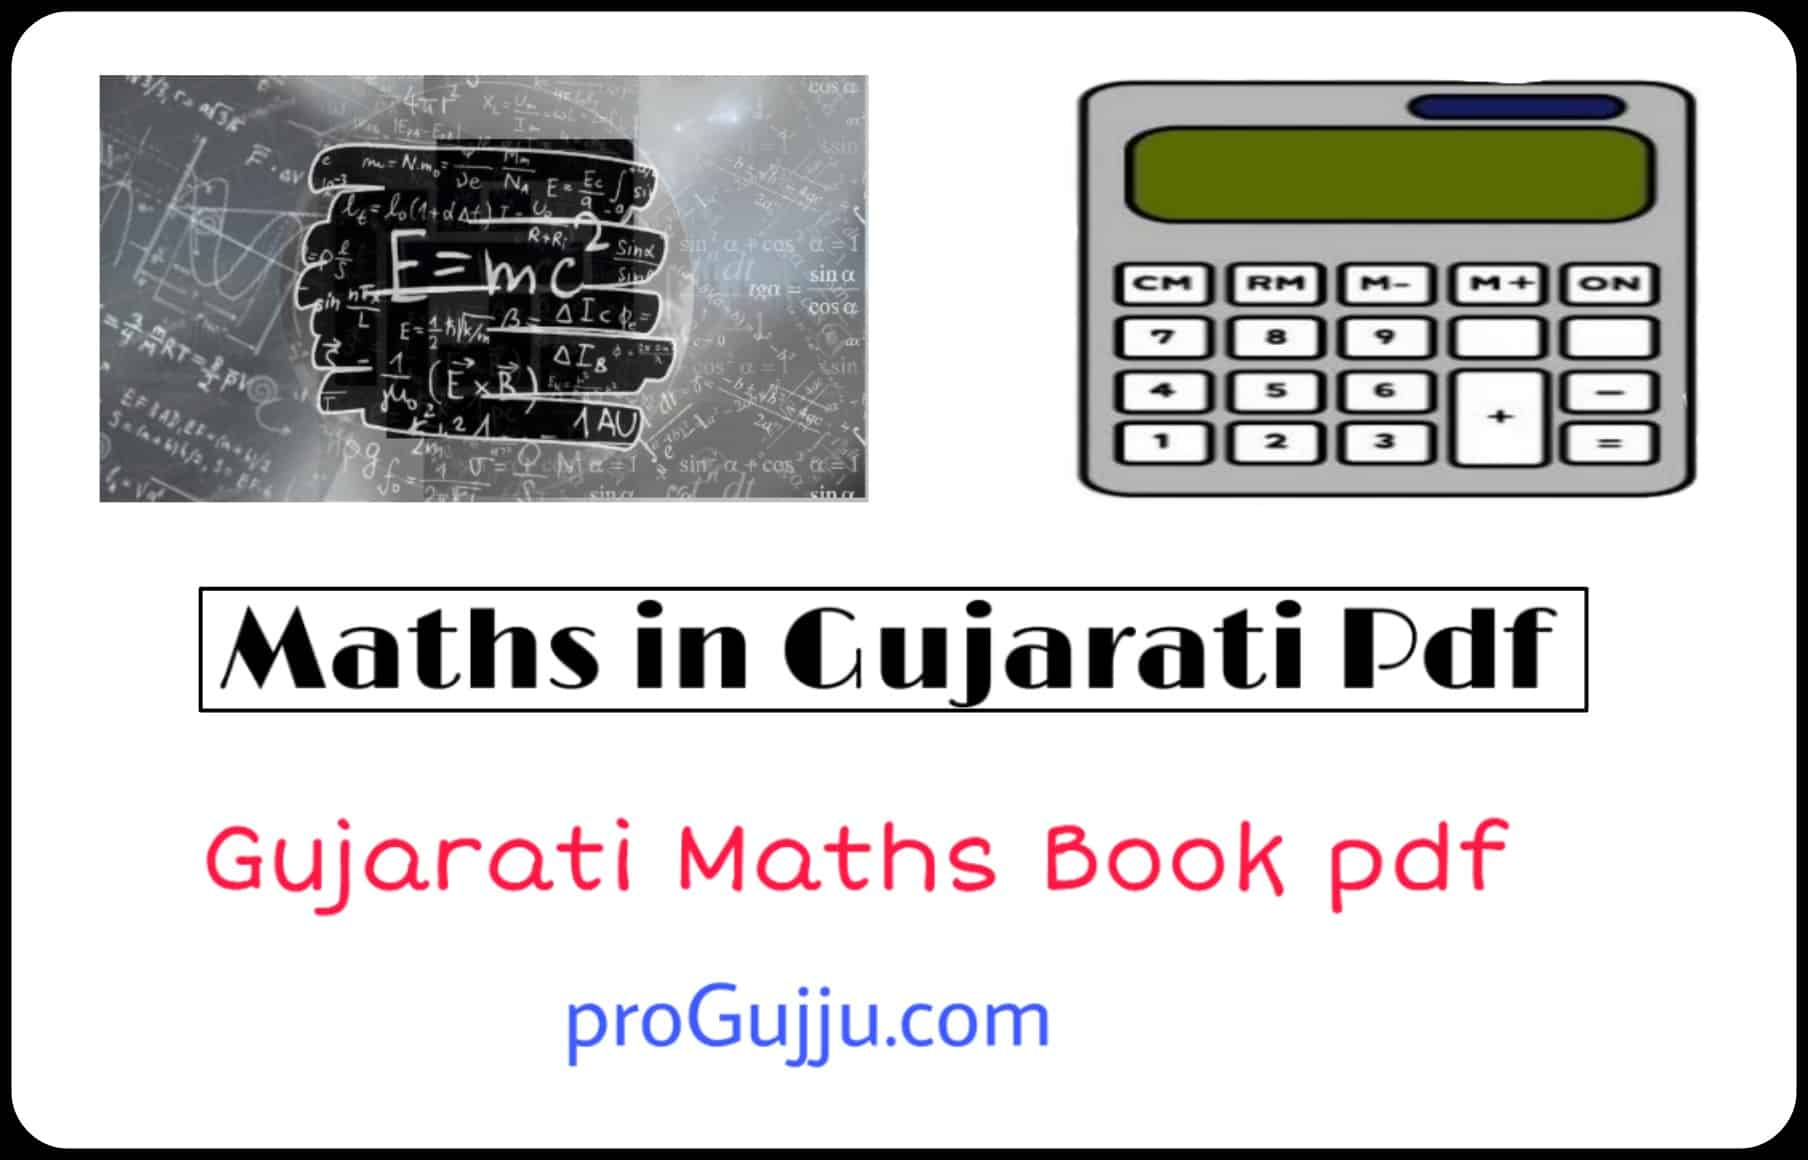 Mathematics pdf in gujarati